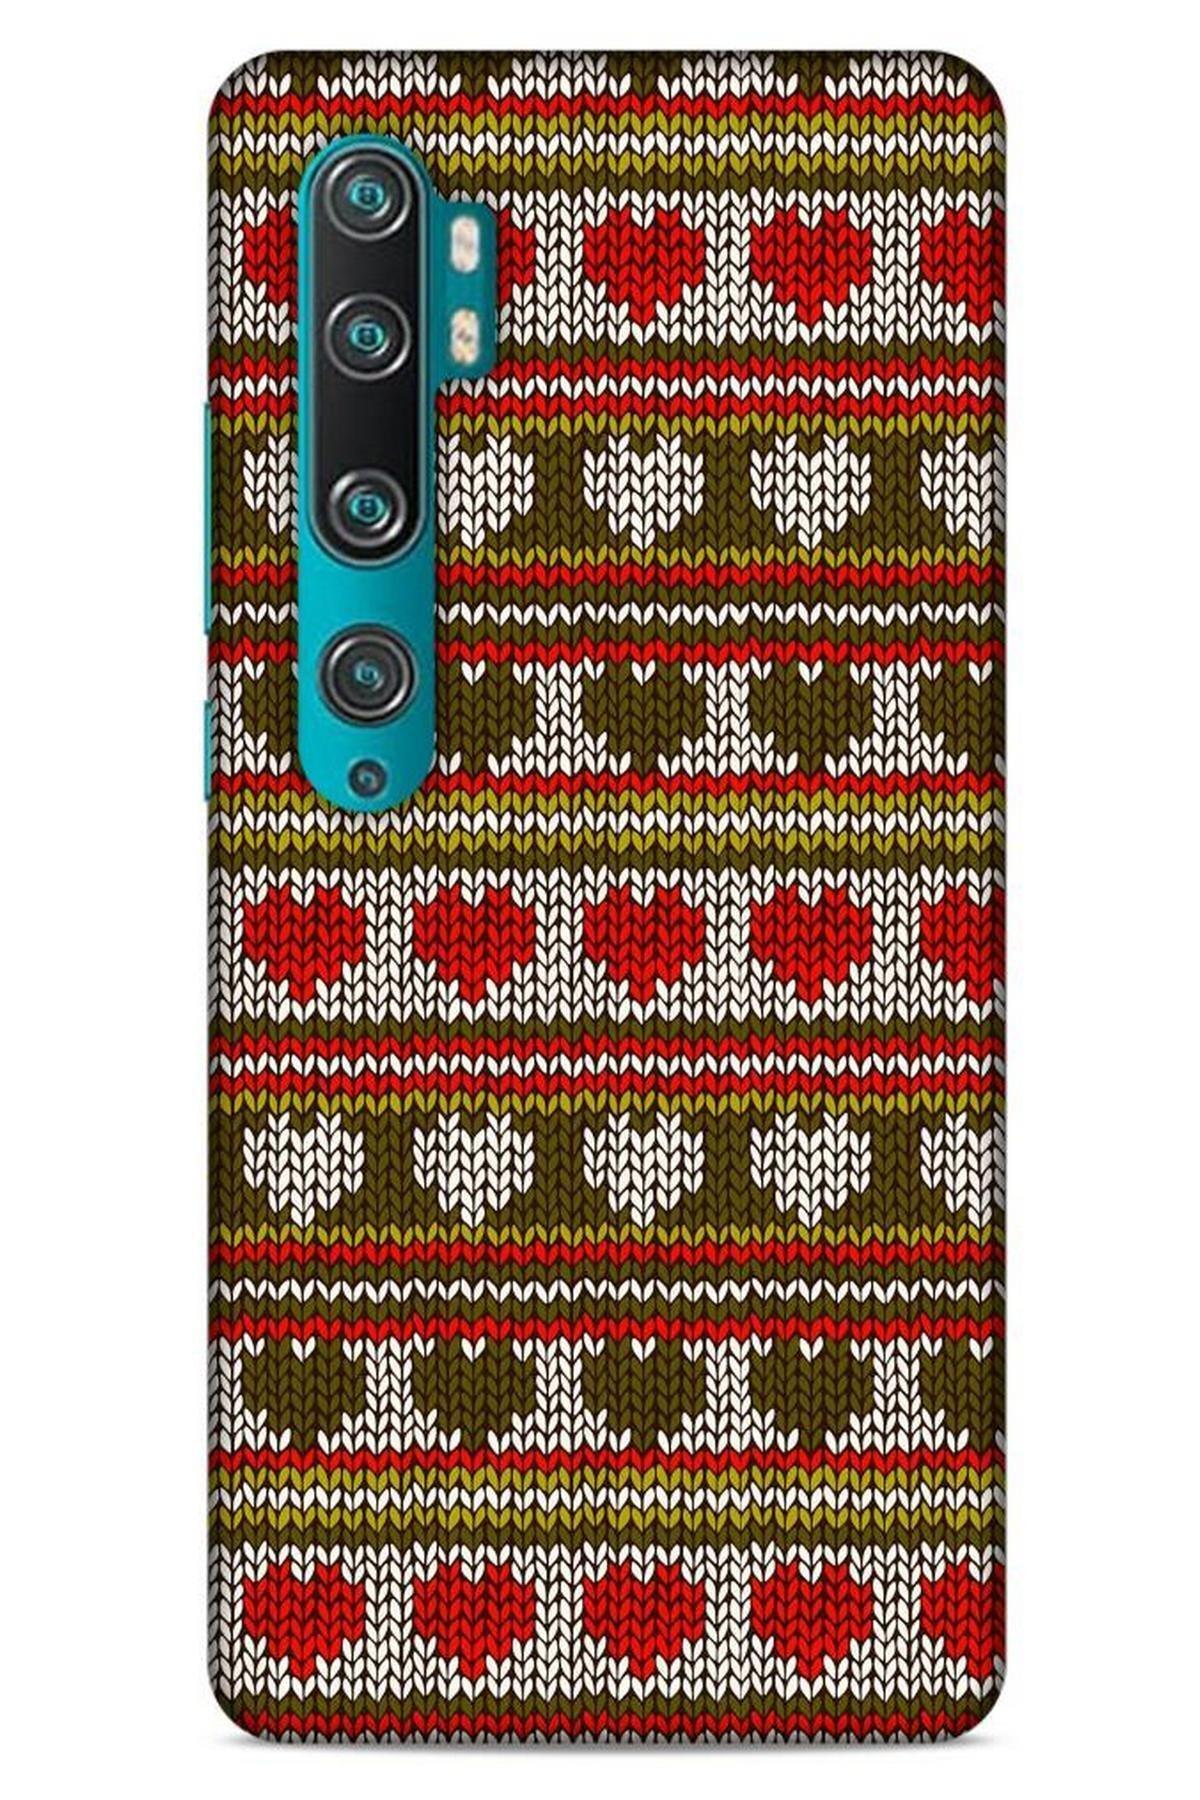 Lopard Kazak (10) Desenli Silikon Kapak Xiaomi Mi Note 10 Pro Uyumlu Kılıf 1